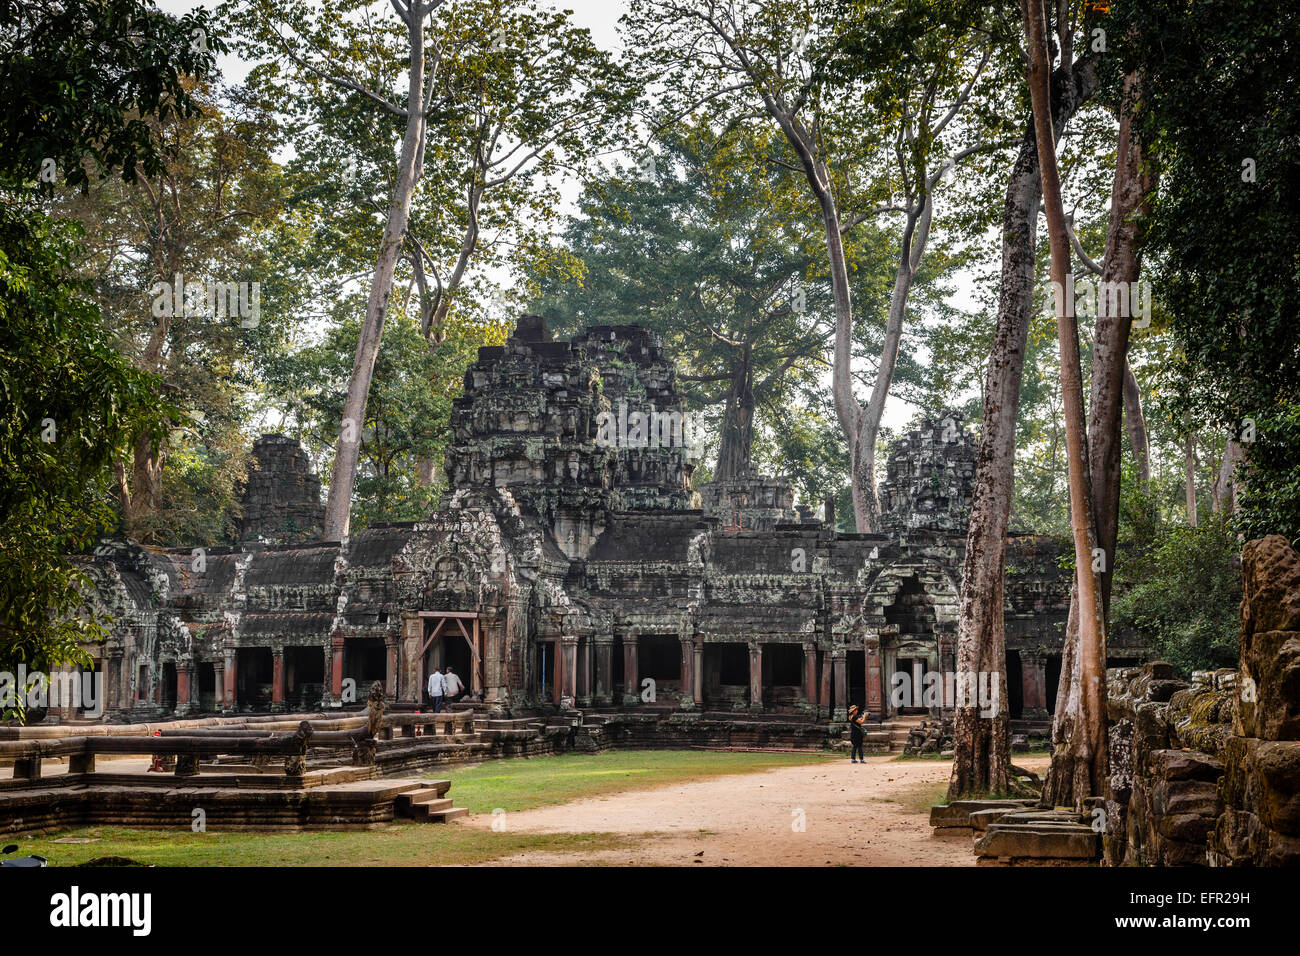 ruins of the Chau Say Tevoda Temple, Angkor, Cambodia. - Stock Image